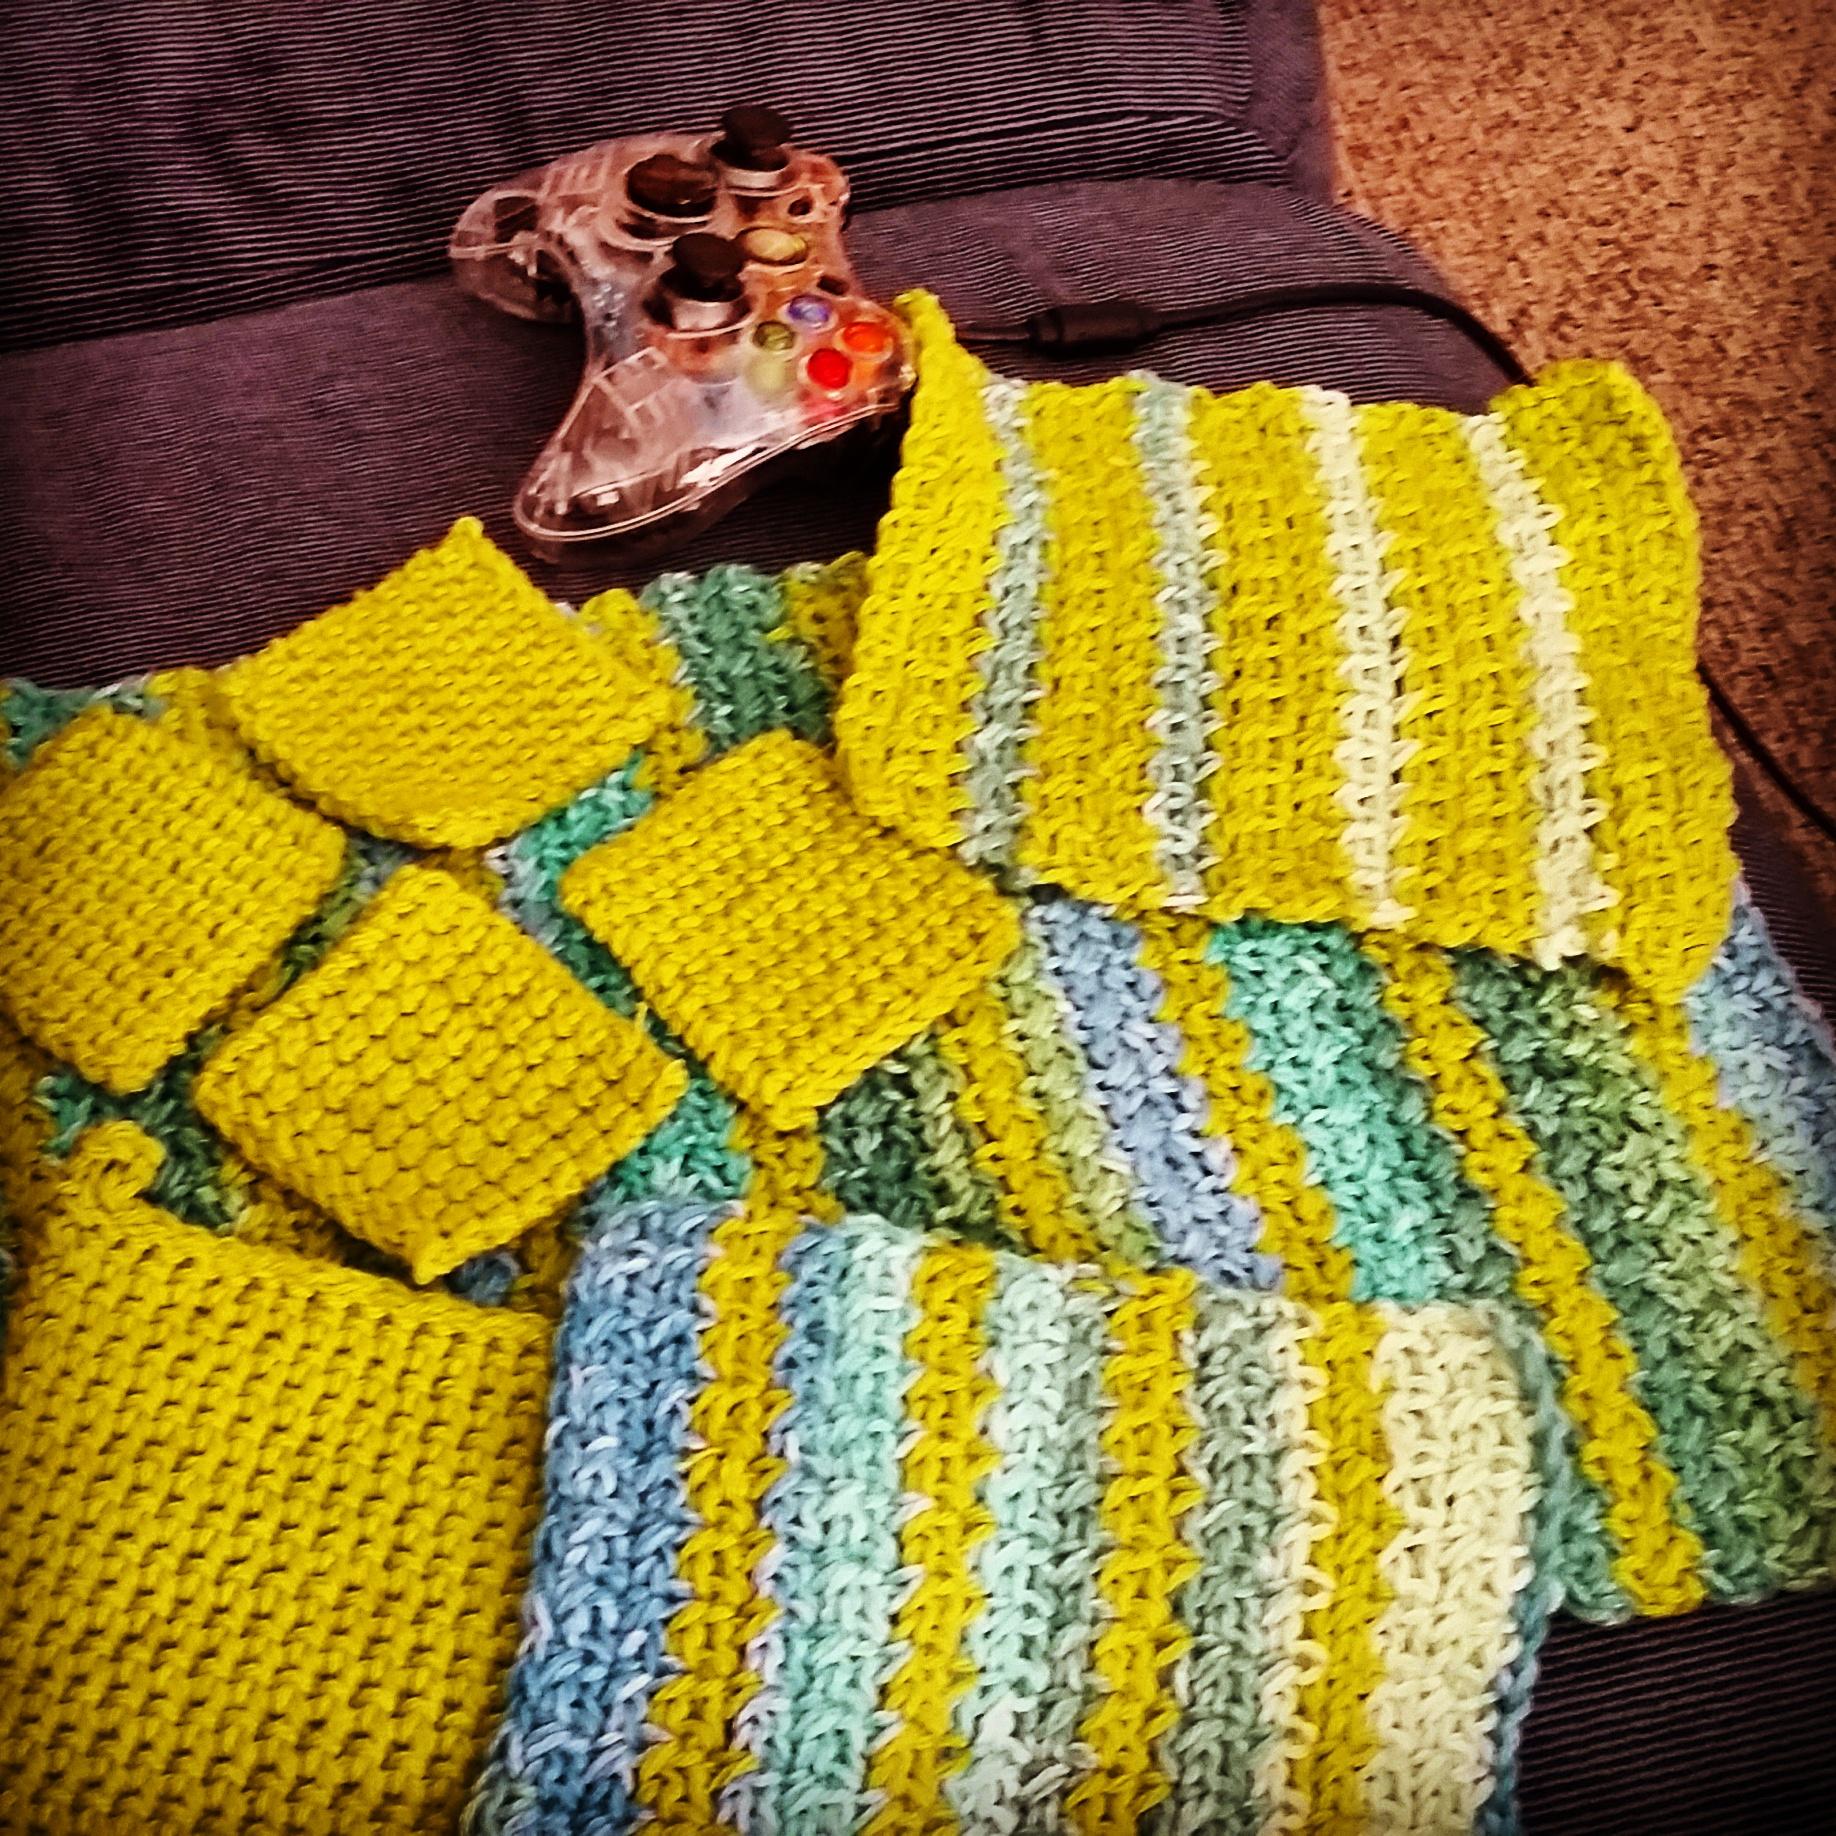 A set of 4 coasters, 2 wash cloths, a dish towel, and a pot holder I made.